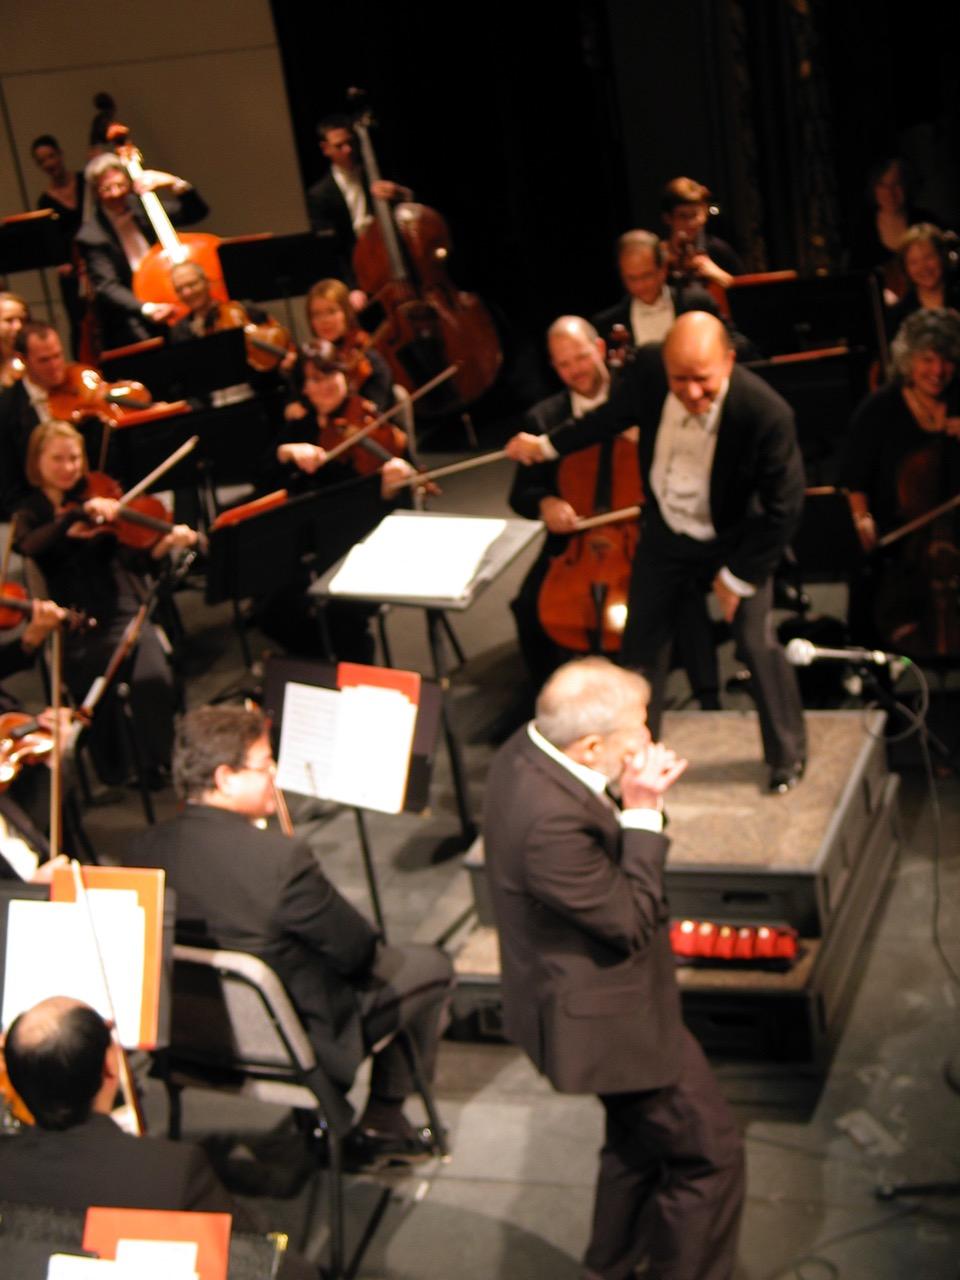 2007 - Symphonic Blues #6 by C. Siegel - Stephen Gunzenhauser conducting the Lancaster Symphony Orchestra